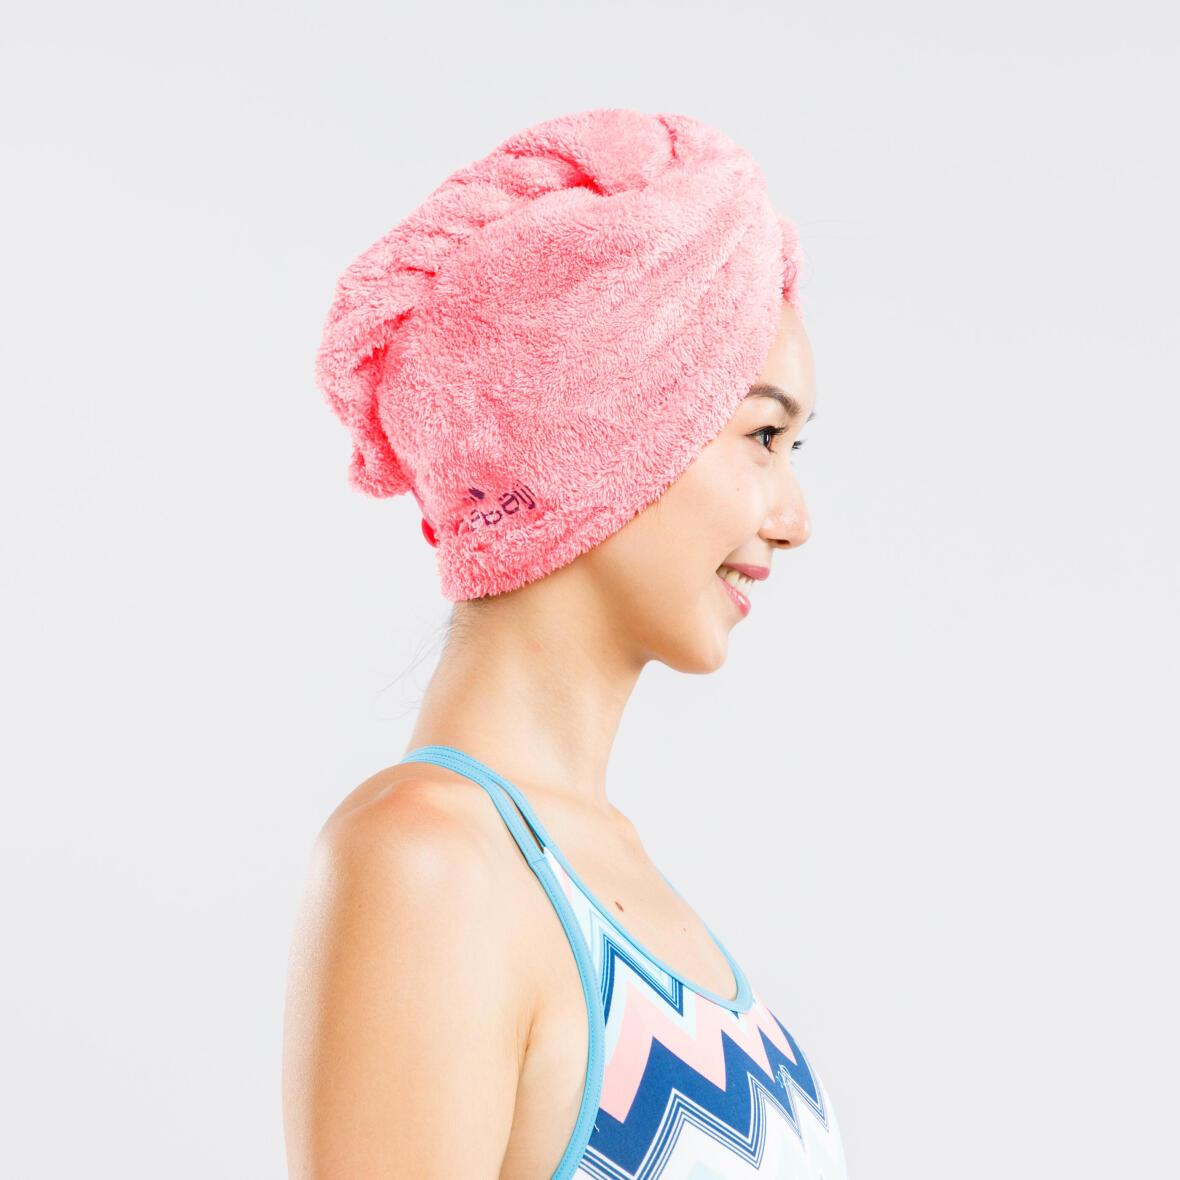 Serviette towel